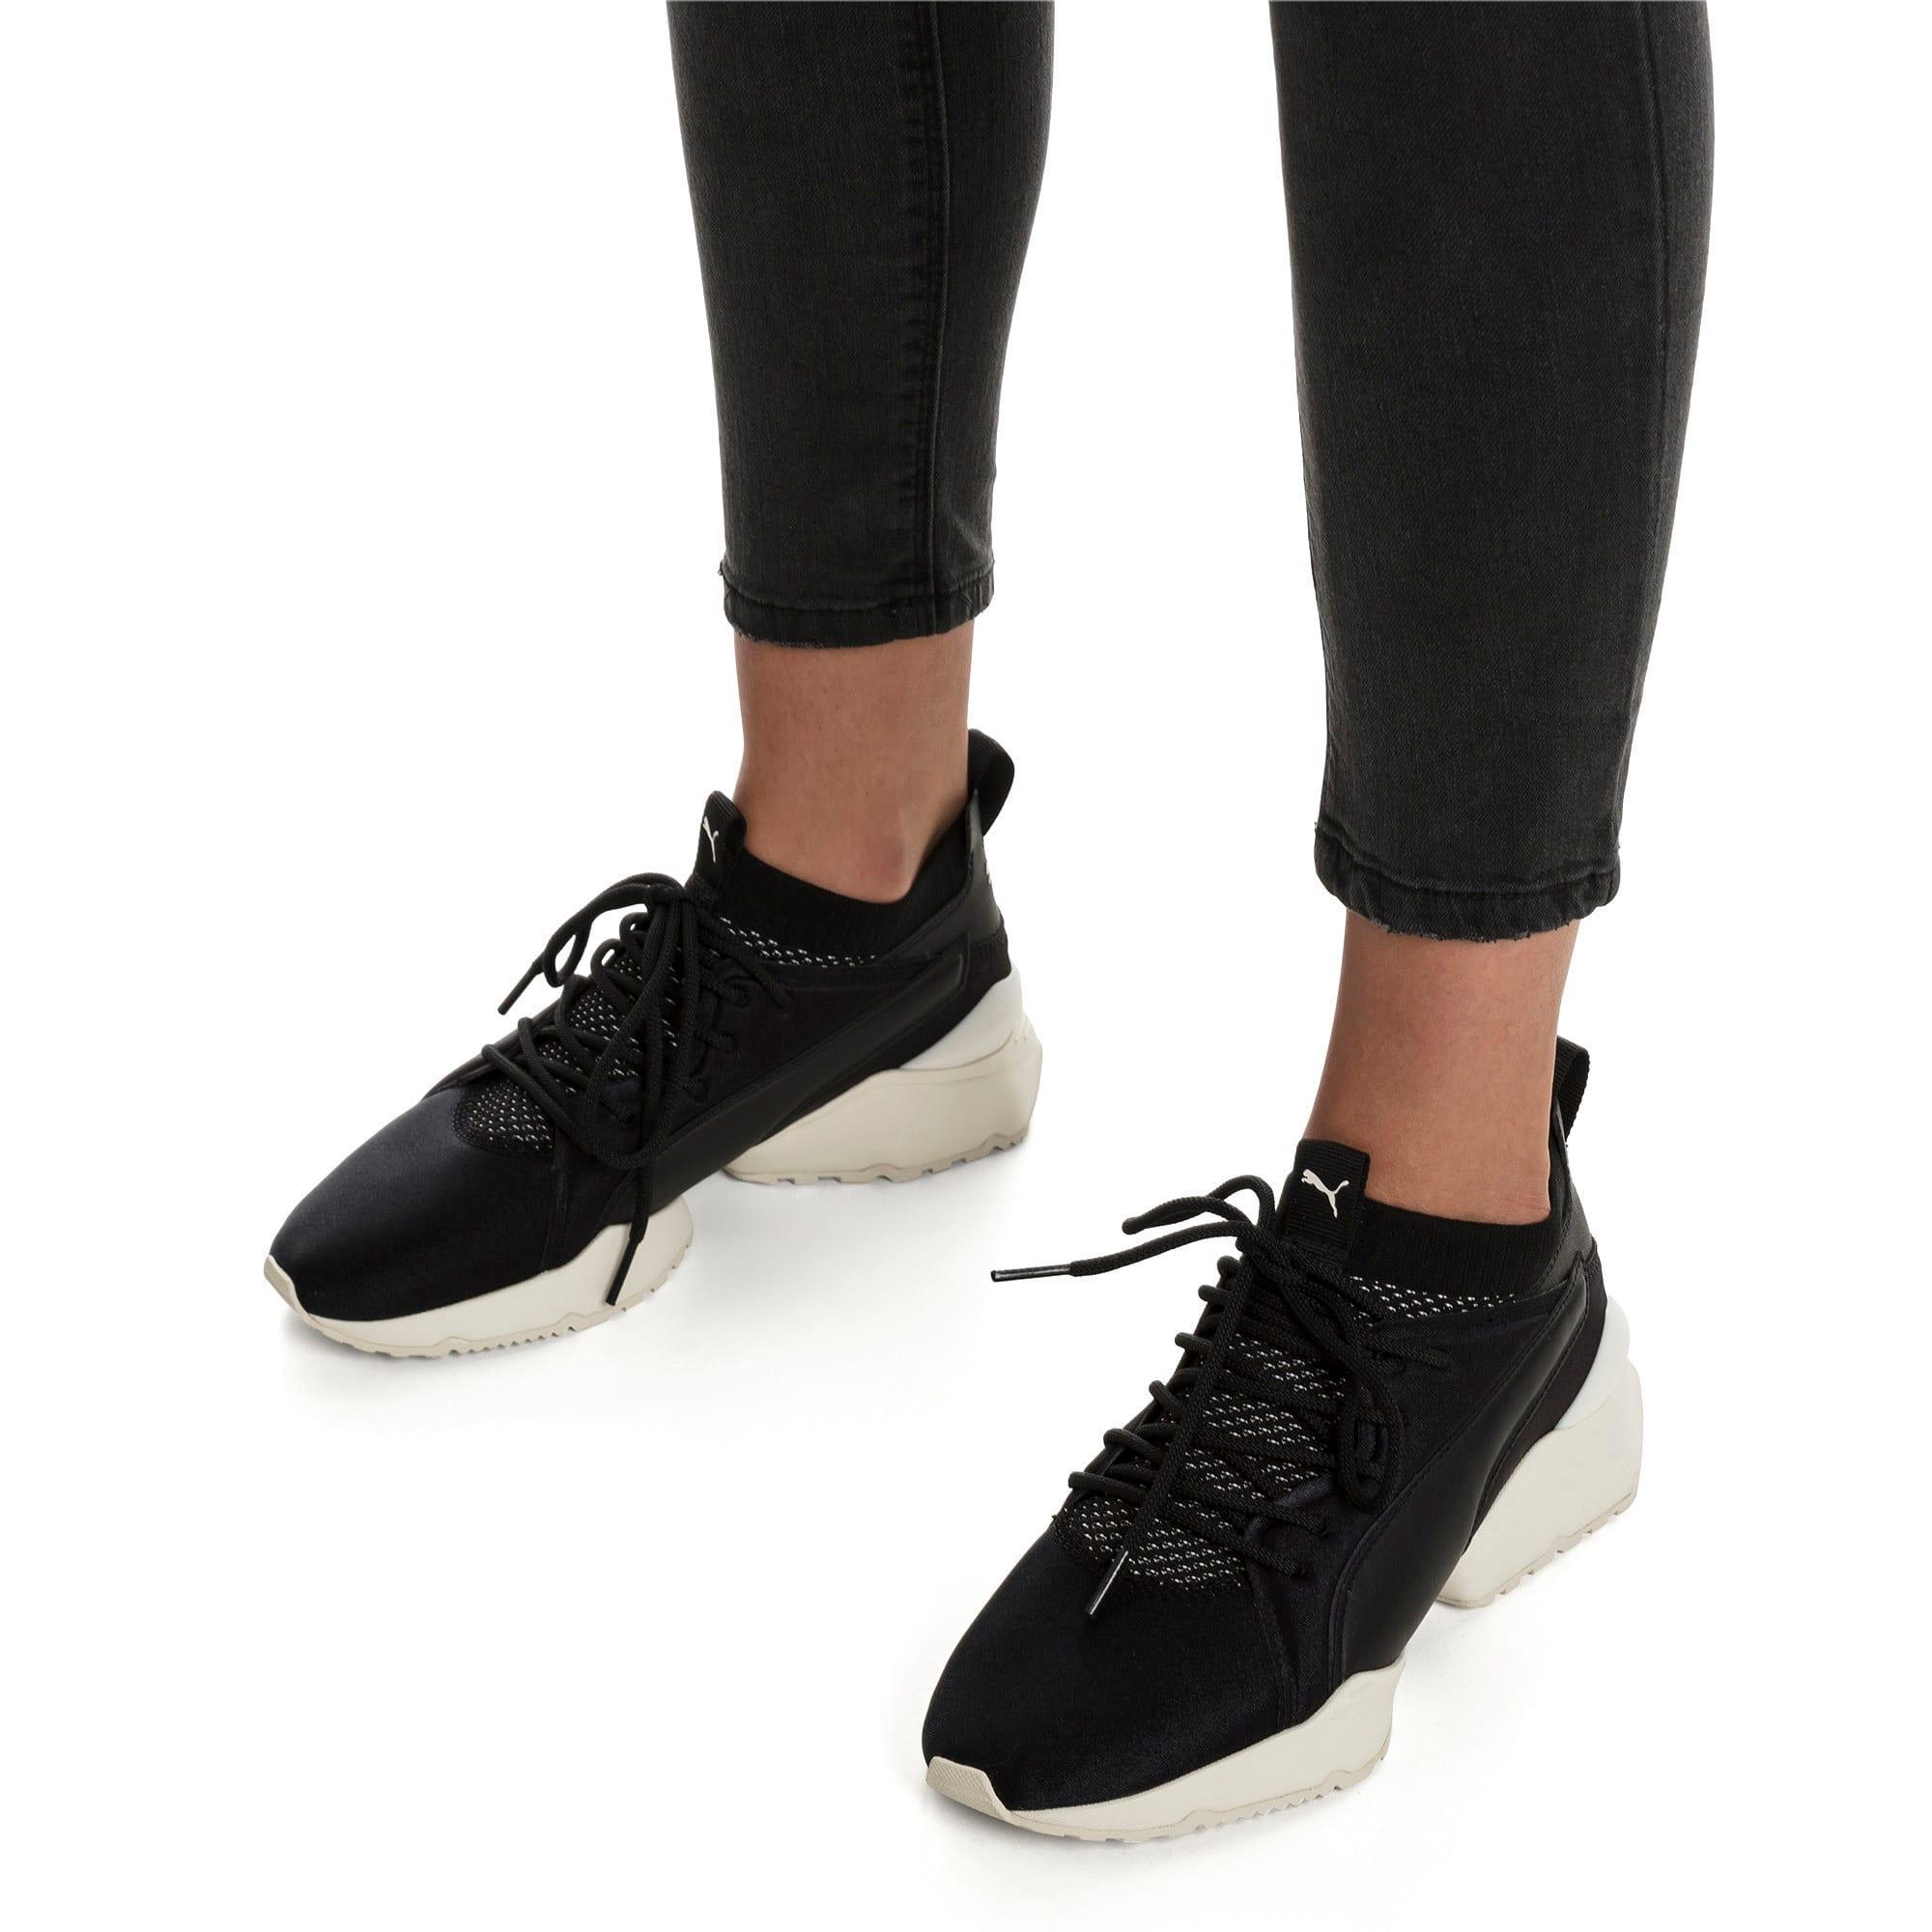 Thumbnail 2 of Muse Maia Knit Premium Women's Trainers, Puma Black-Whisper White, medium-IND